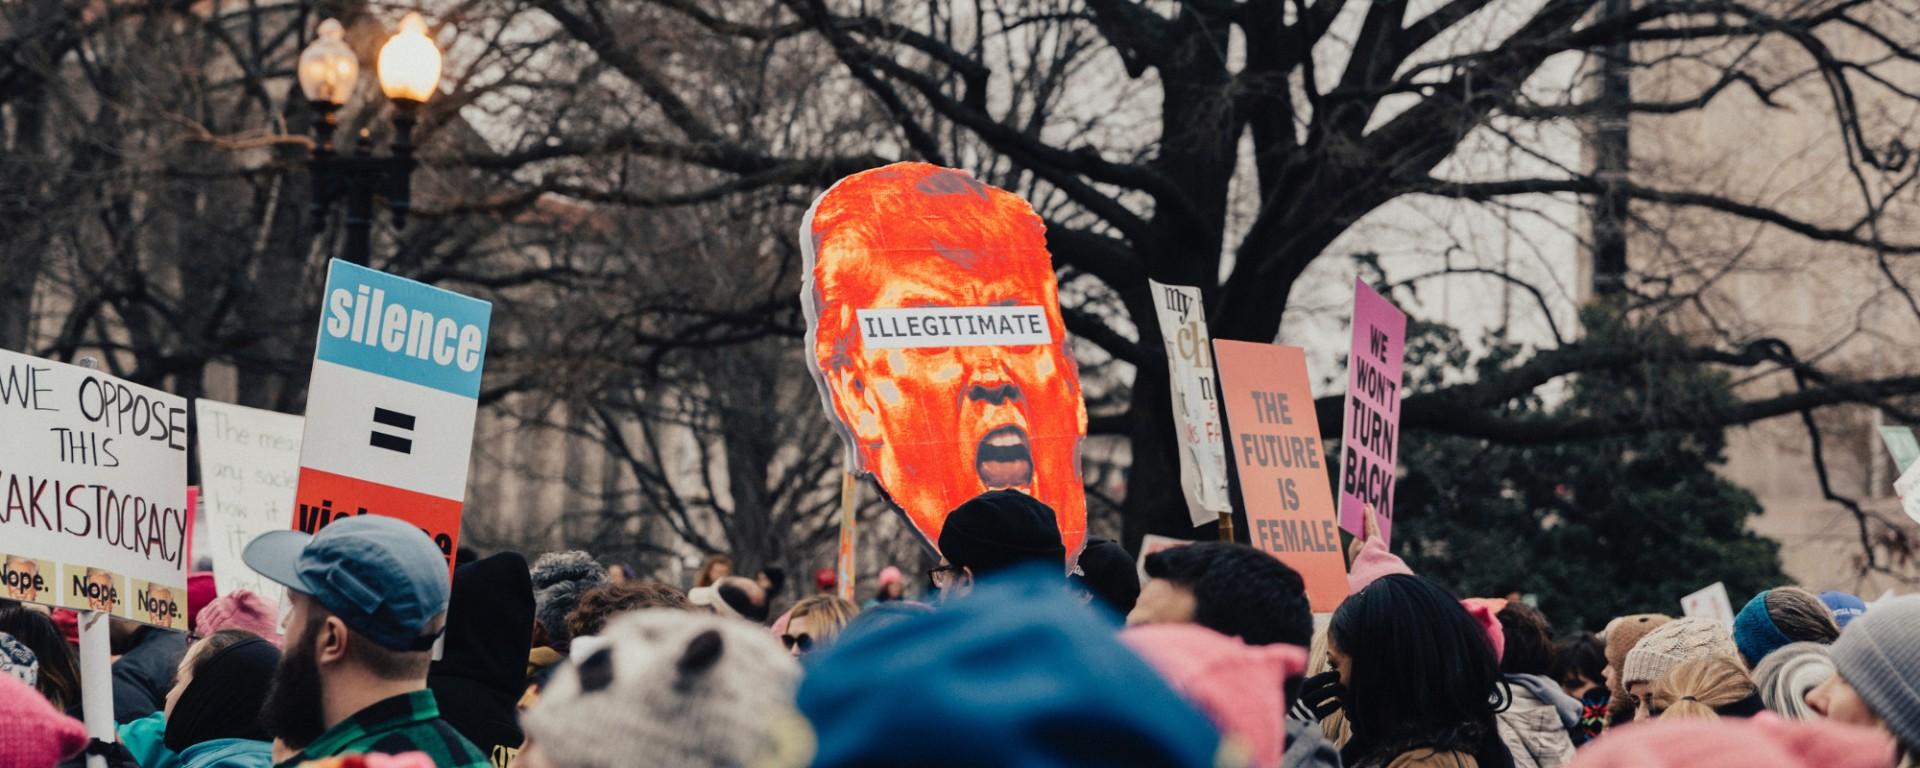 Donald Trump. Image: Roya Ann Miller on Unsplash